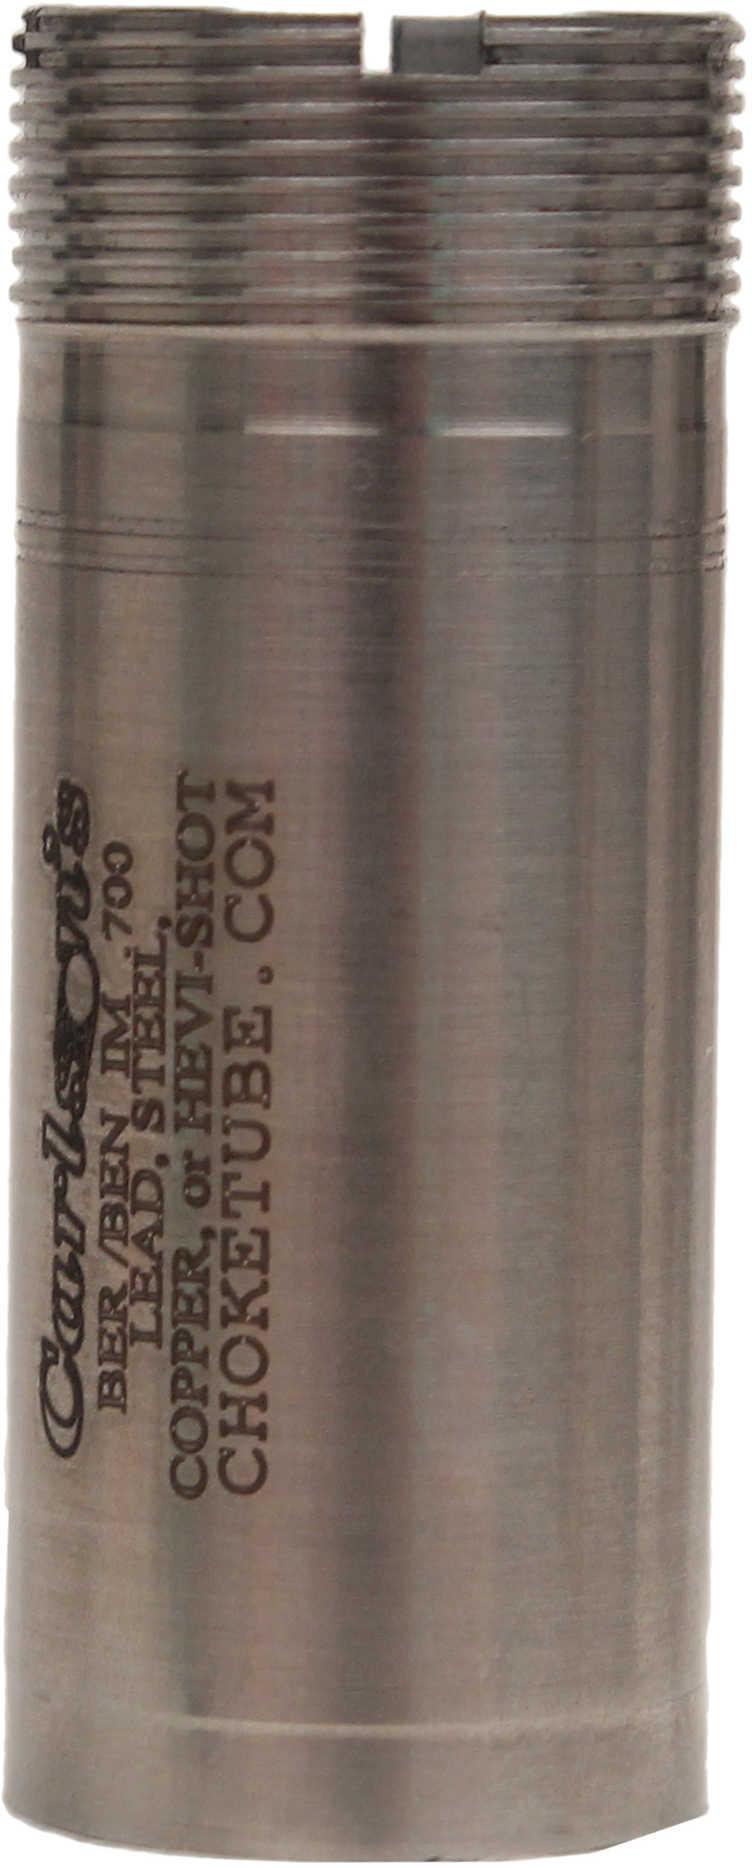 Carlson's Beretta/Benelli Choke Tubes Flush Mount, 12 Gauge, Improved Modified .700 Md: 16615